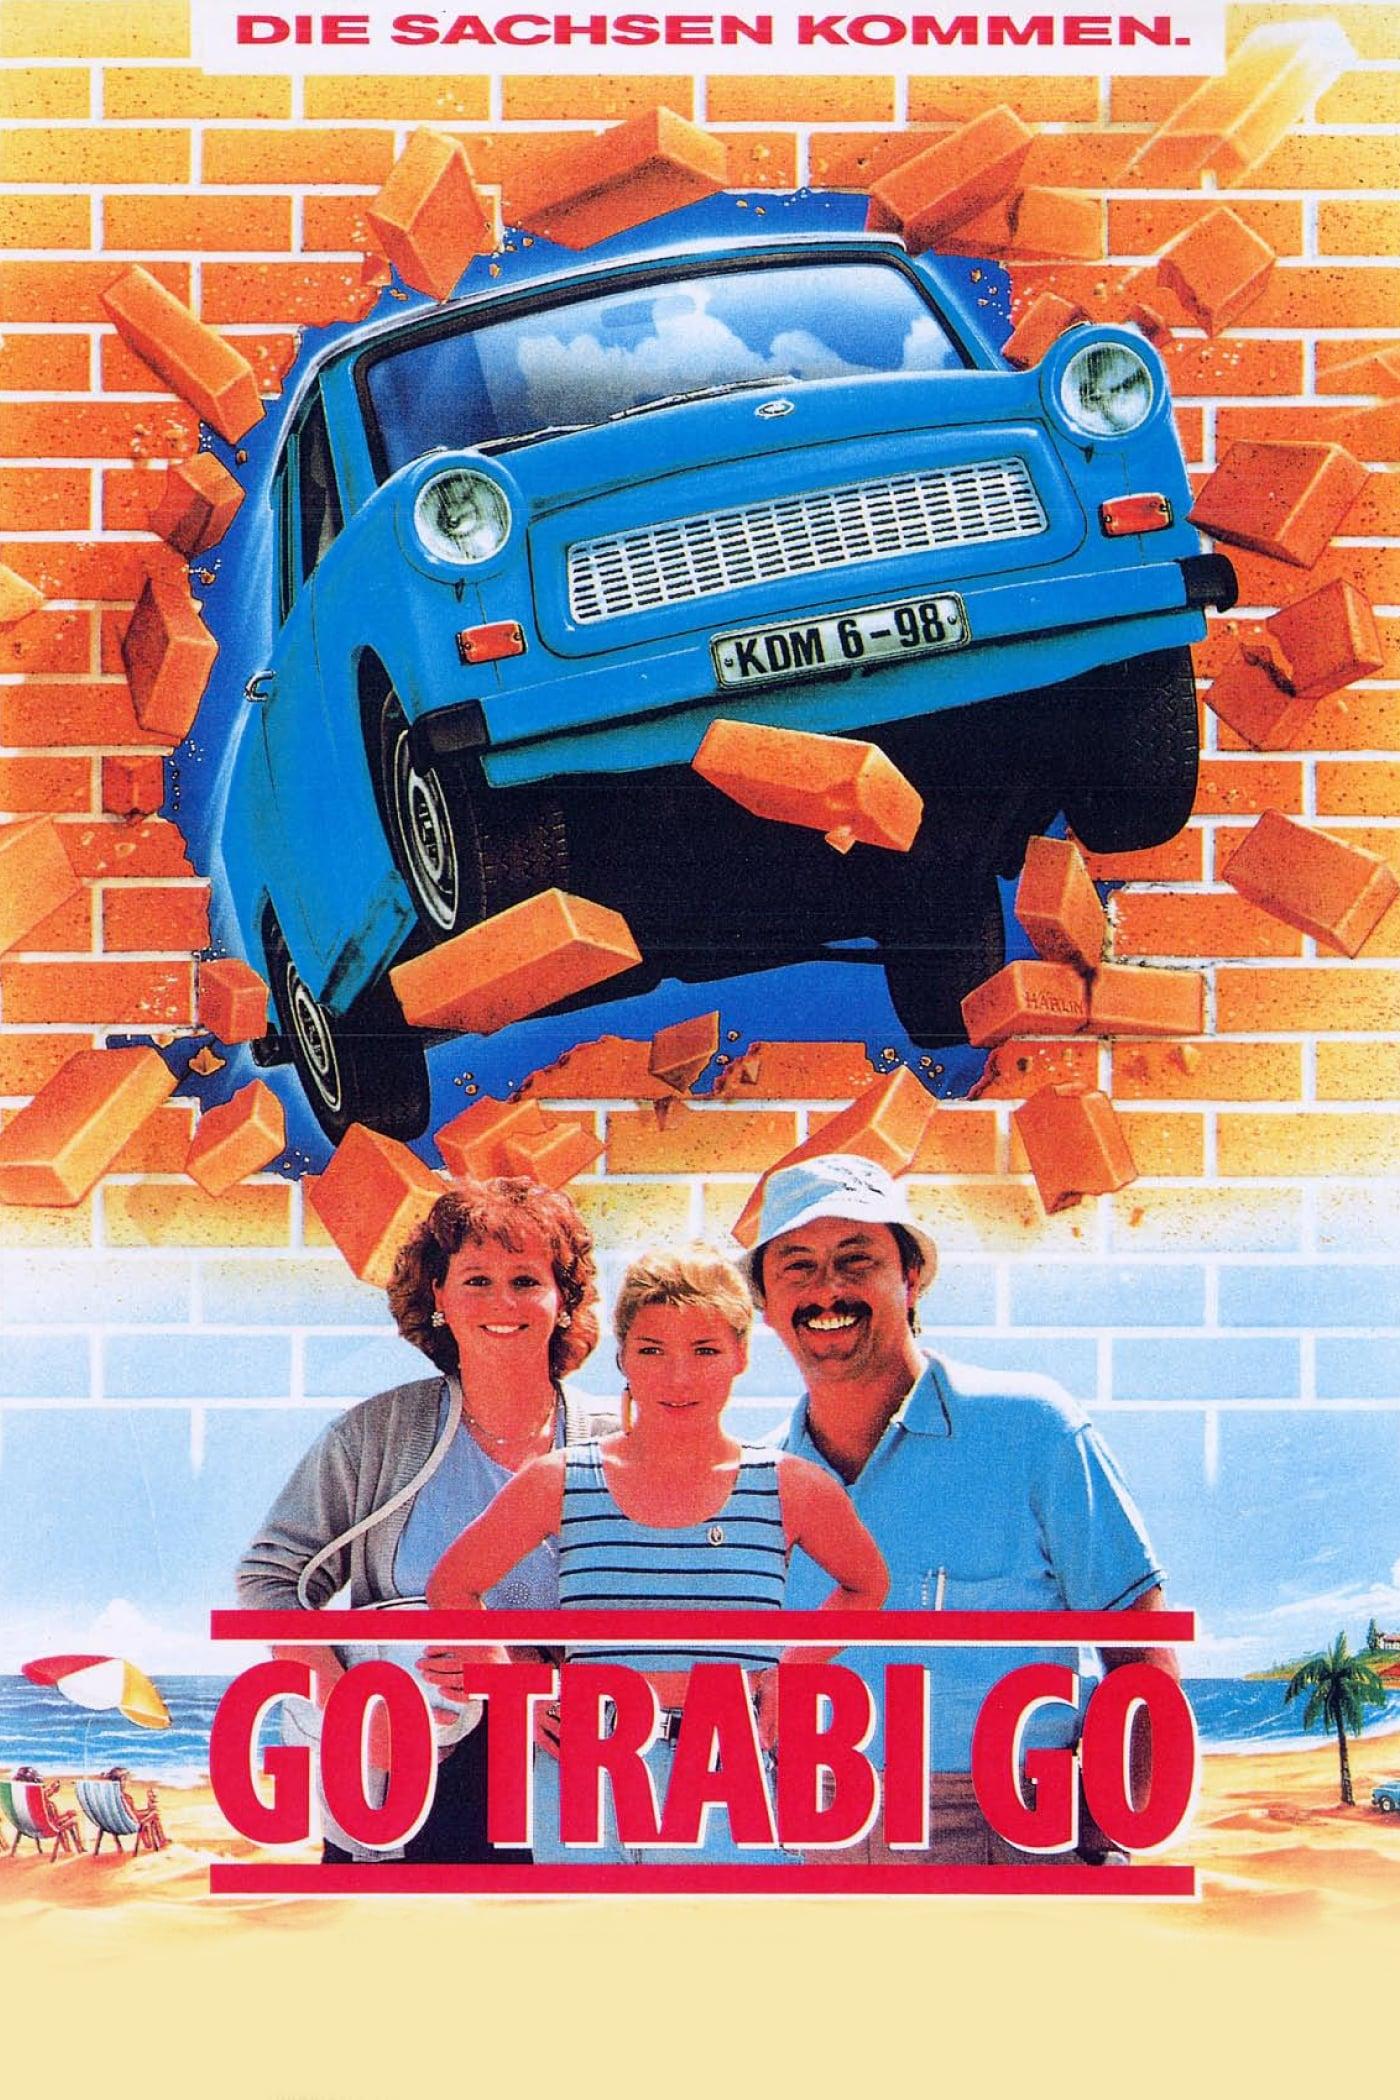 Go To Www Bing Comhella: Go Trabi Go (1991) • Movies.film-cine.com